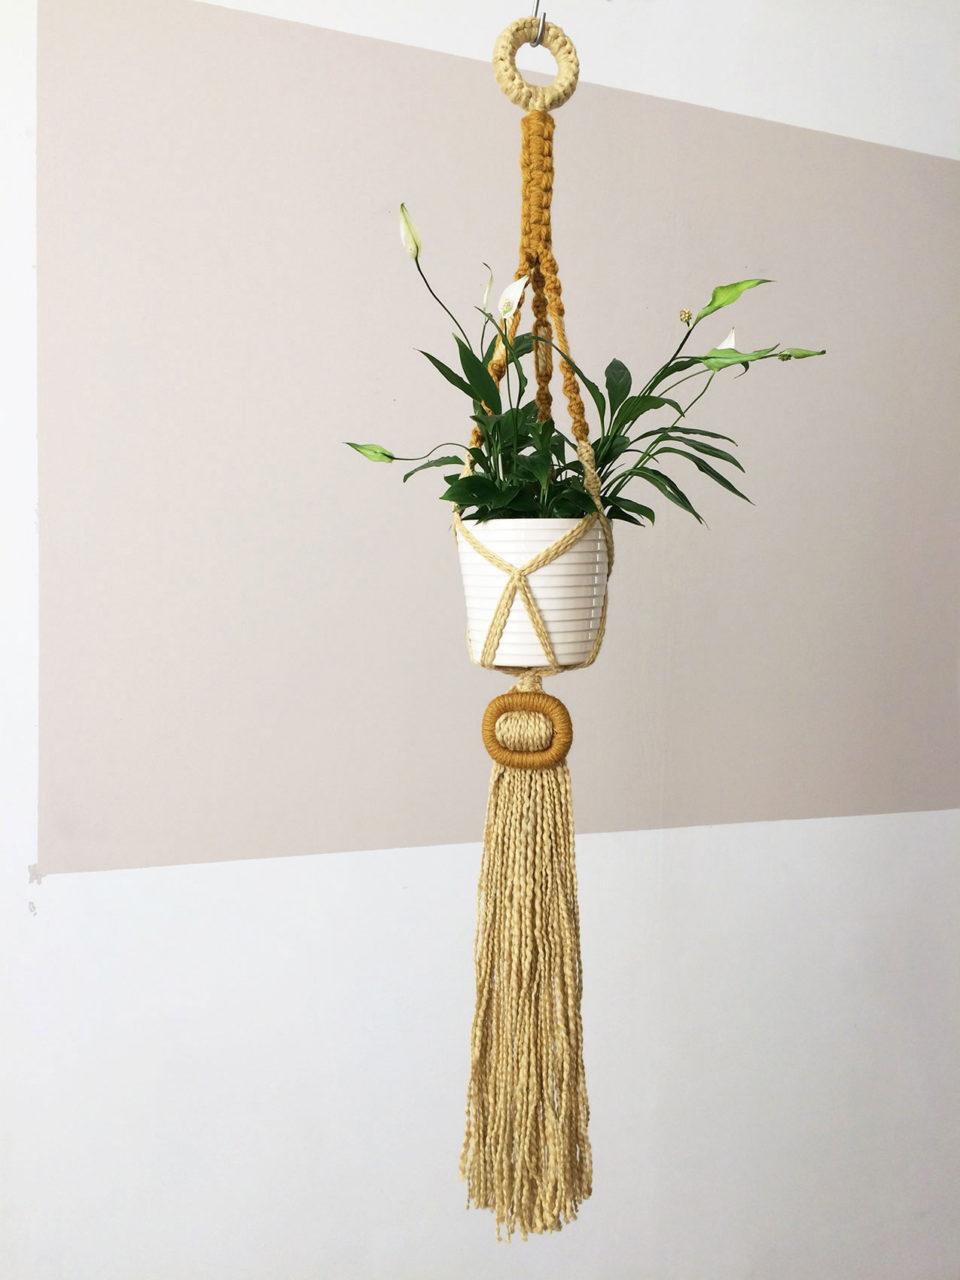 Buckle_Macrame_Plant_Hanger_03_Ochre_LightYellow